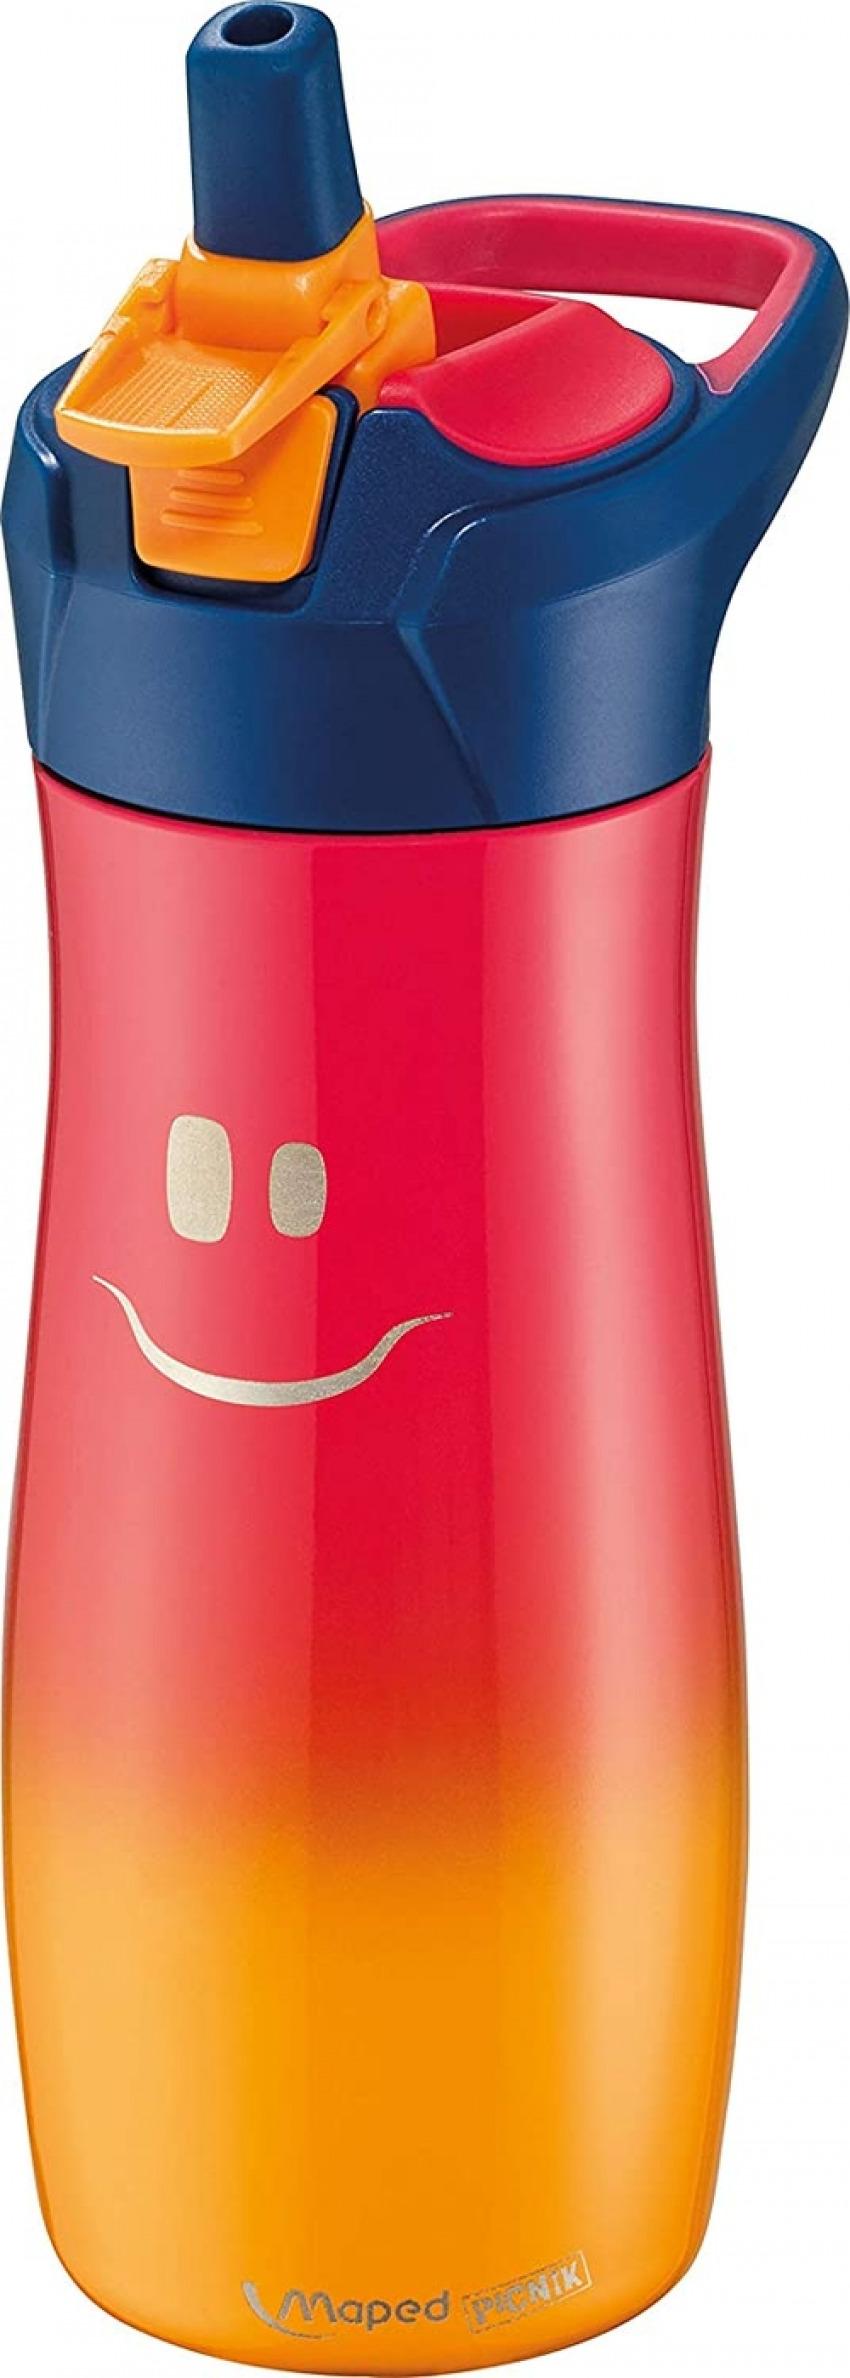 Botella 580ml en acero inoxidable concept kids rosa 3154148713012